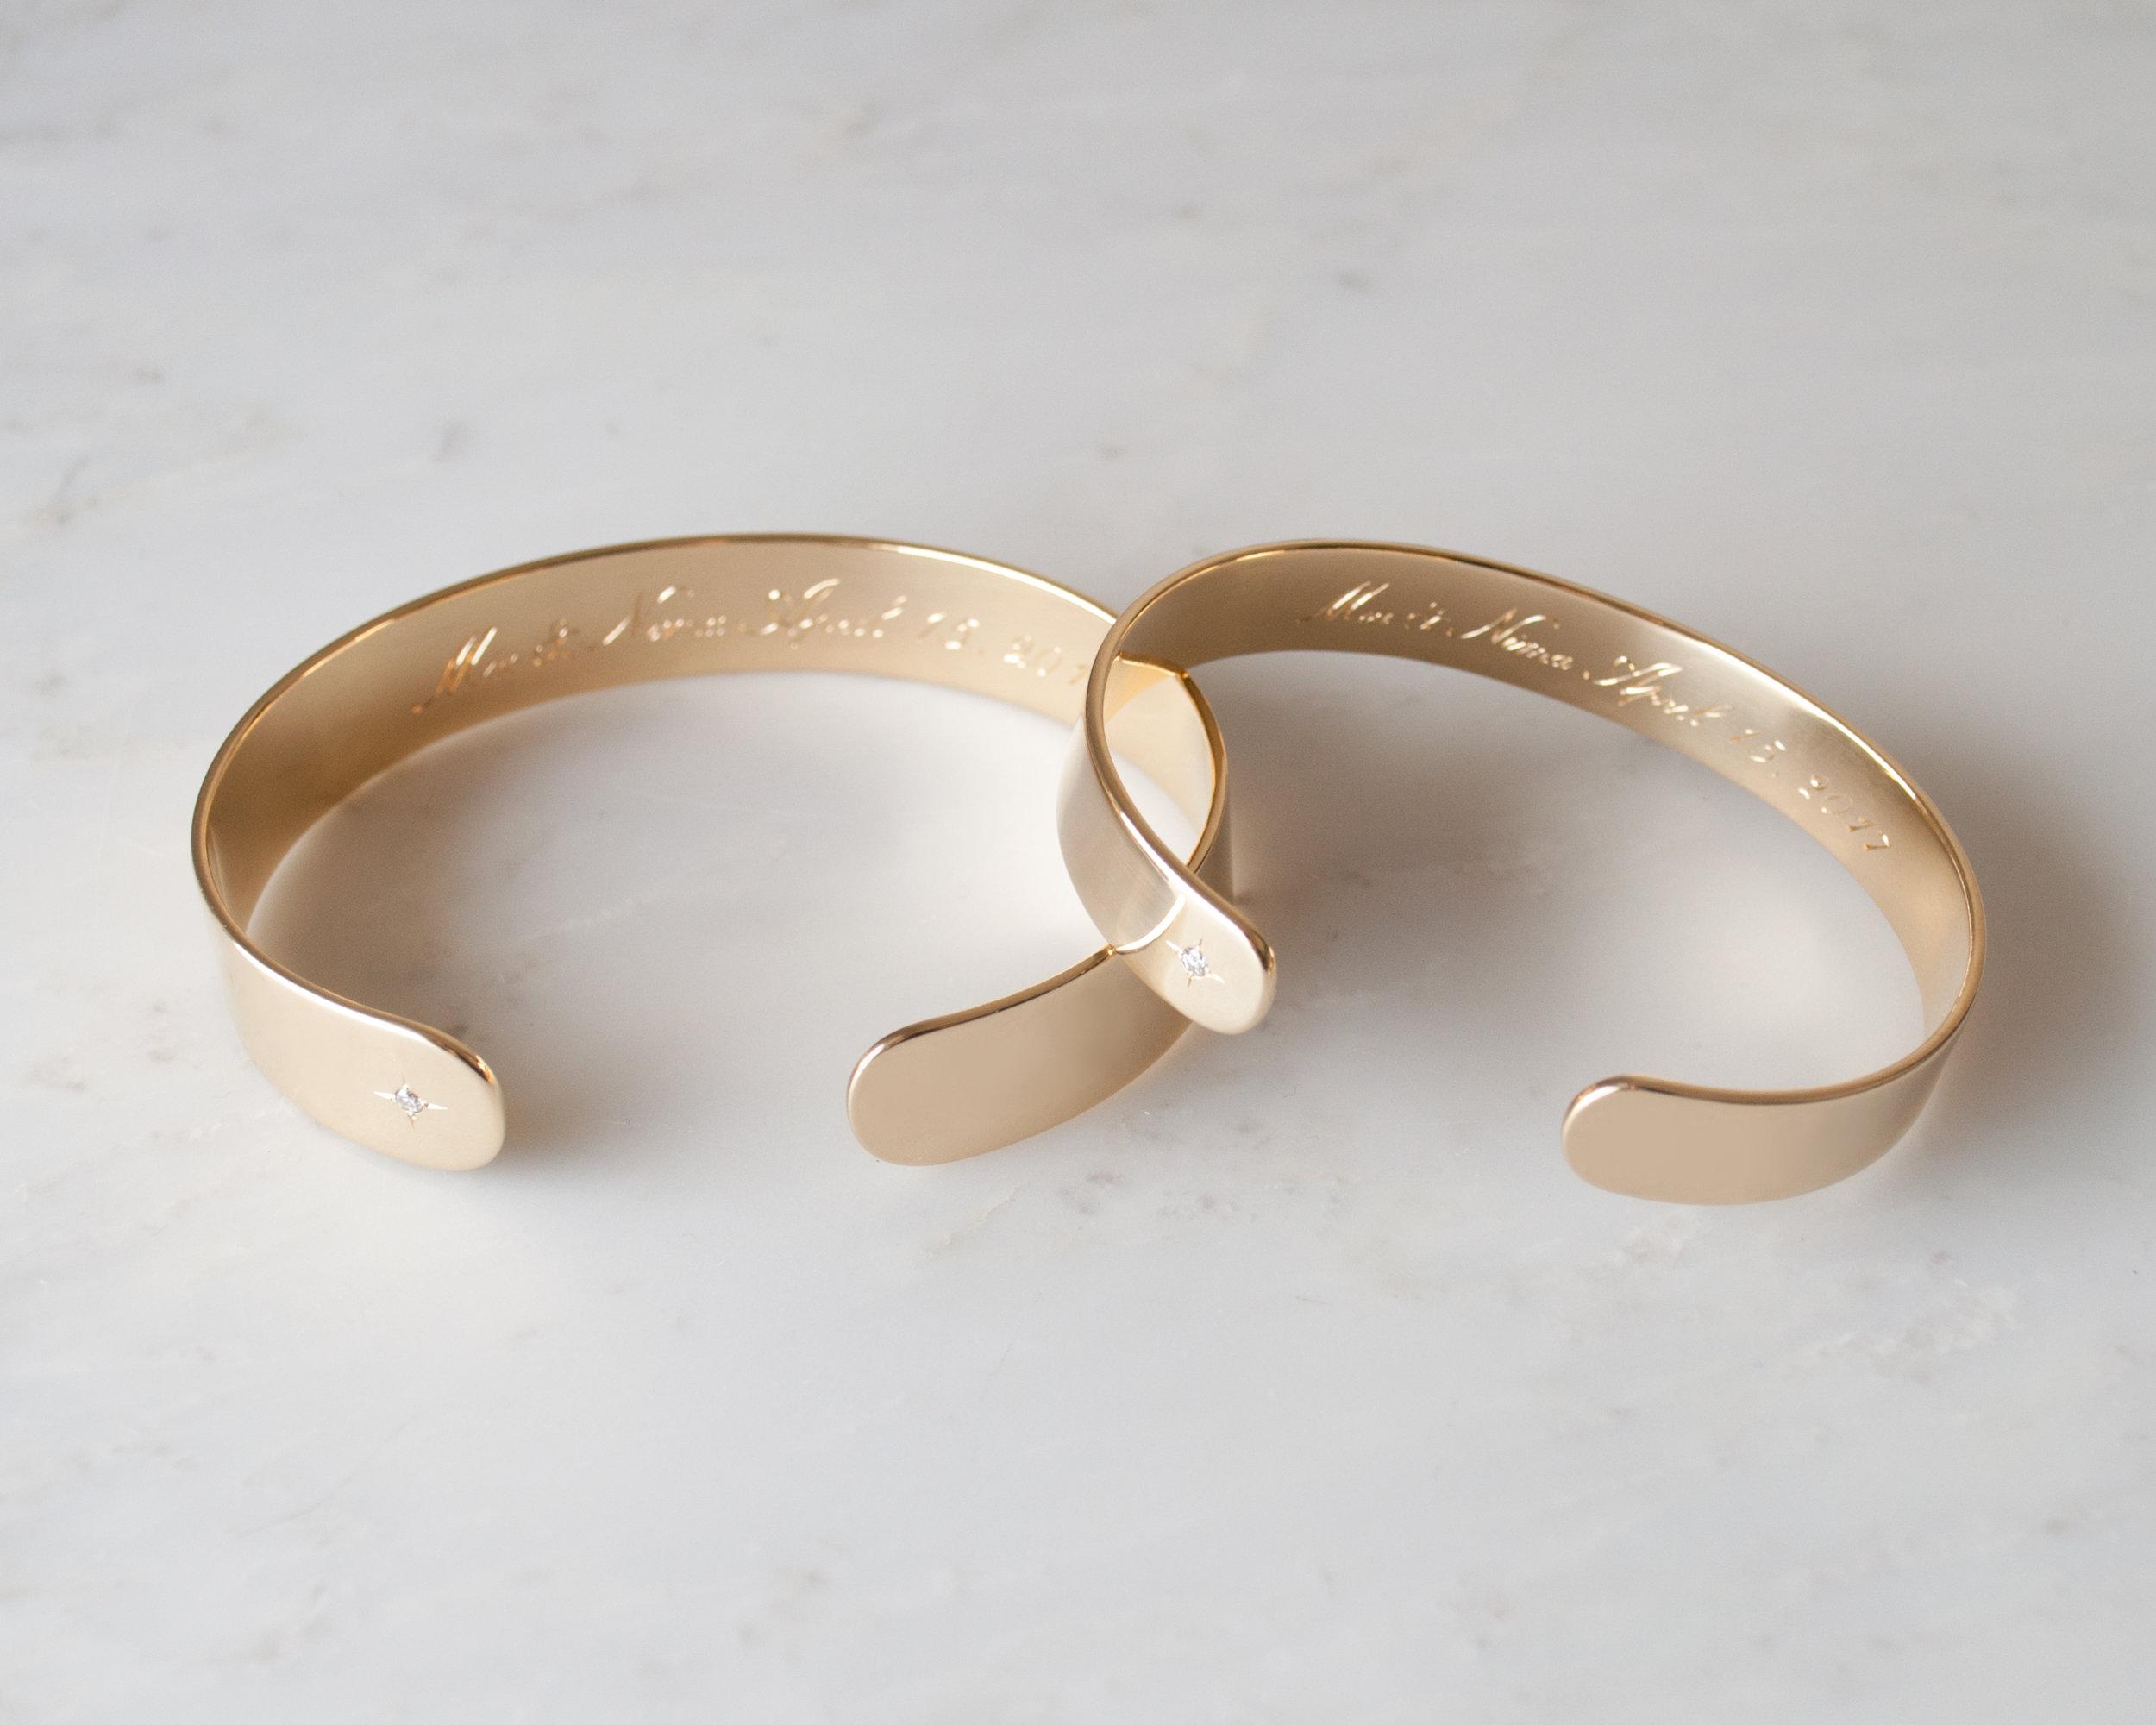 Mia and Nima bracelets 2.jpg